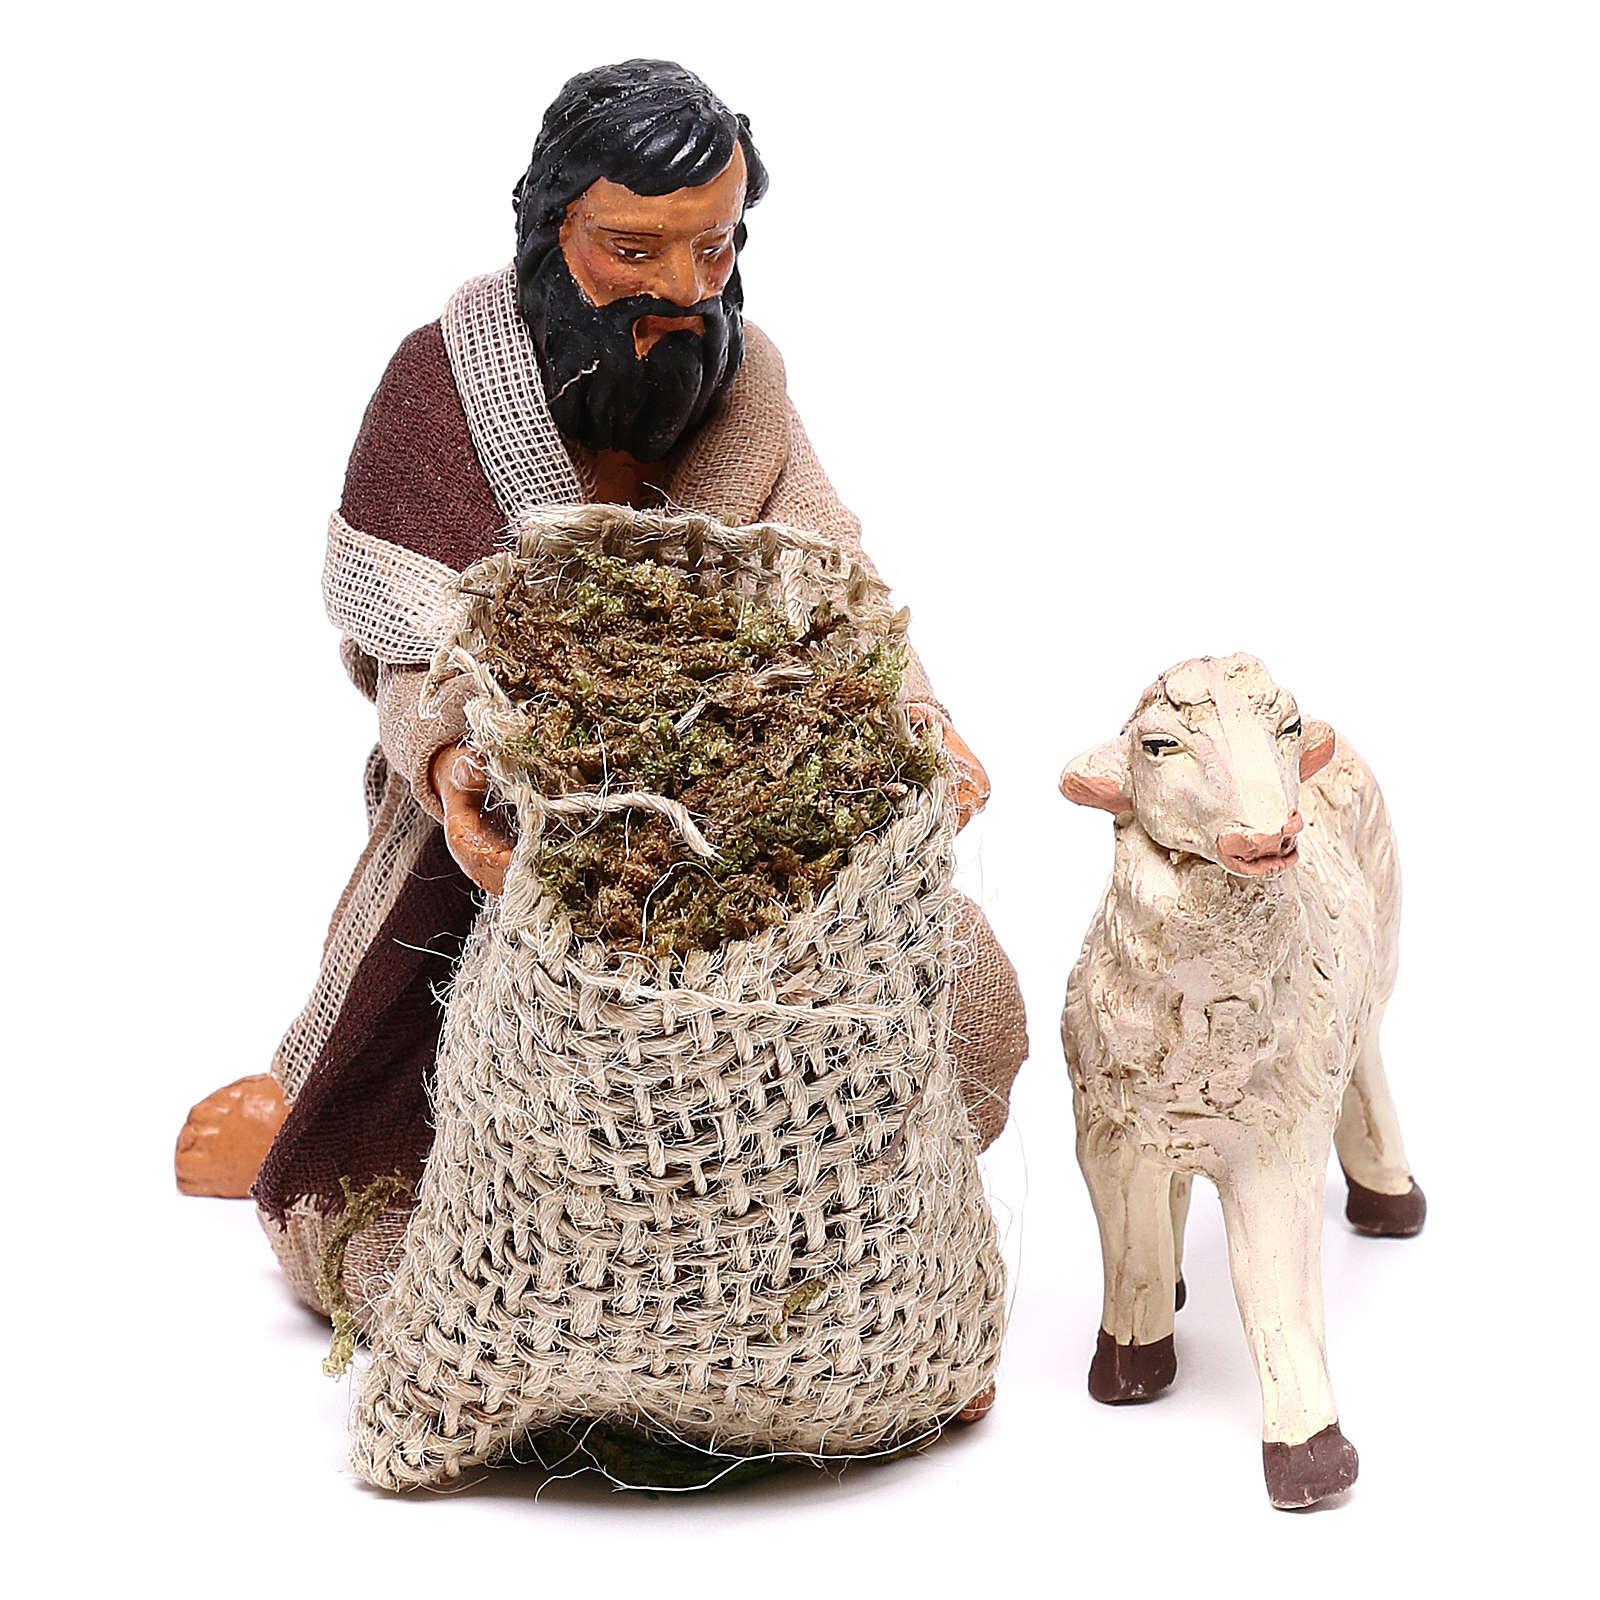 Kneeling man feeding sheep 13 cm, Neapolitan Nativity figurine 4